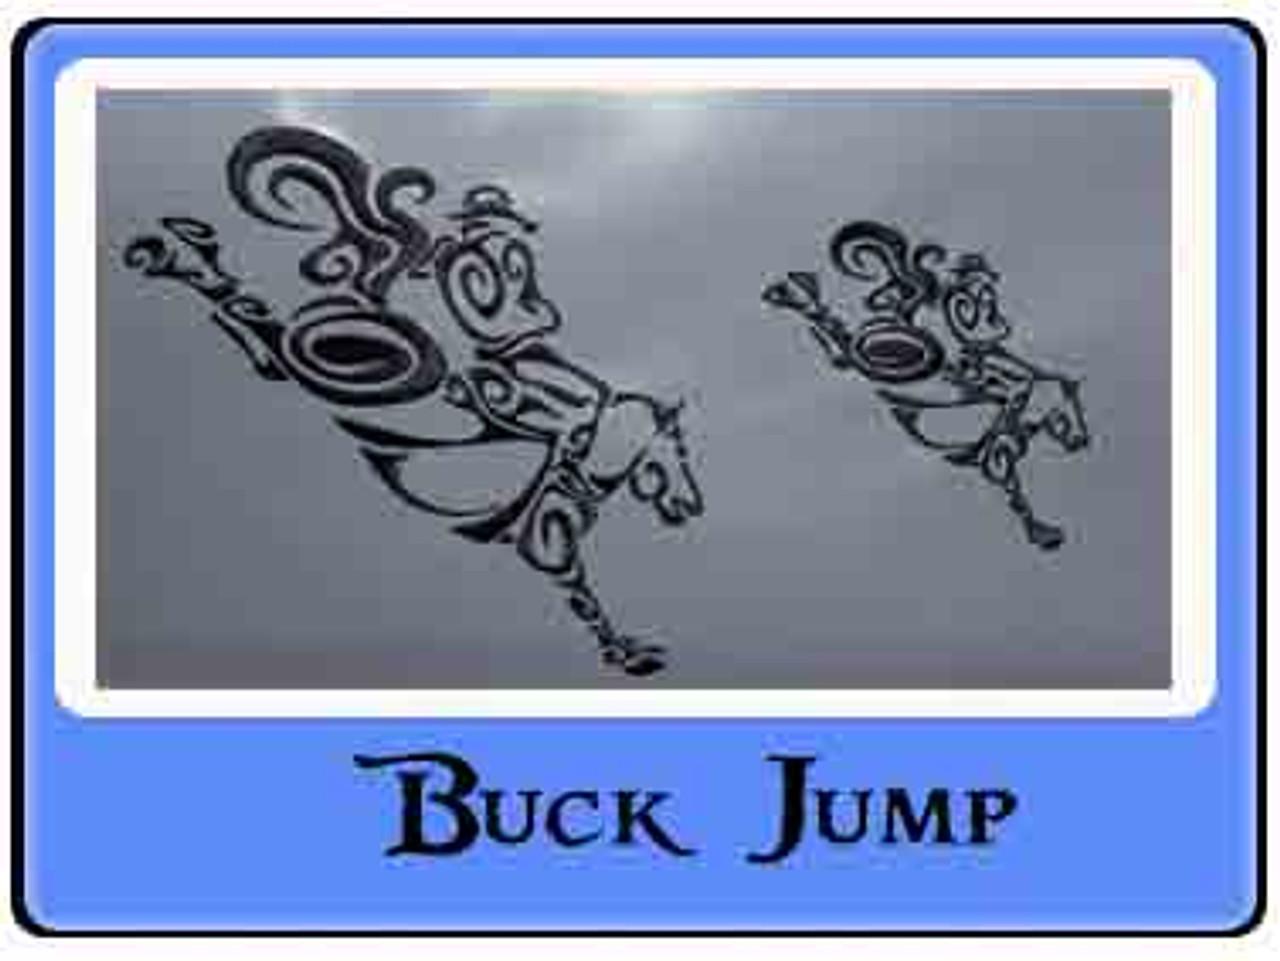 EMB BUCK JUMP Bags in Big Bag Menu only